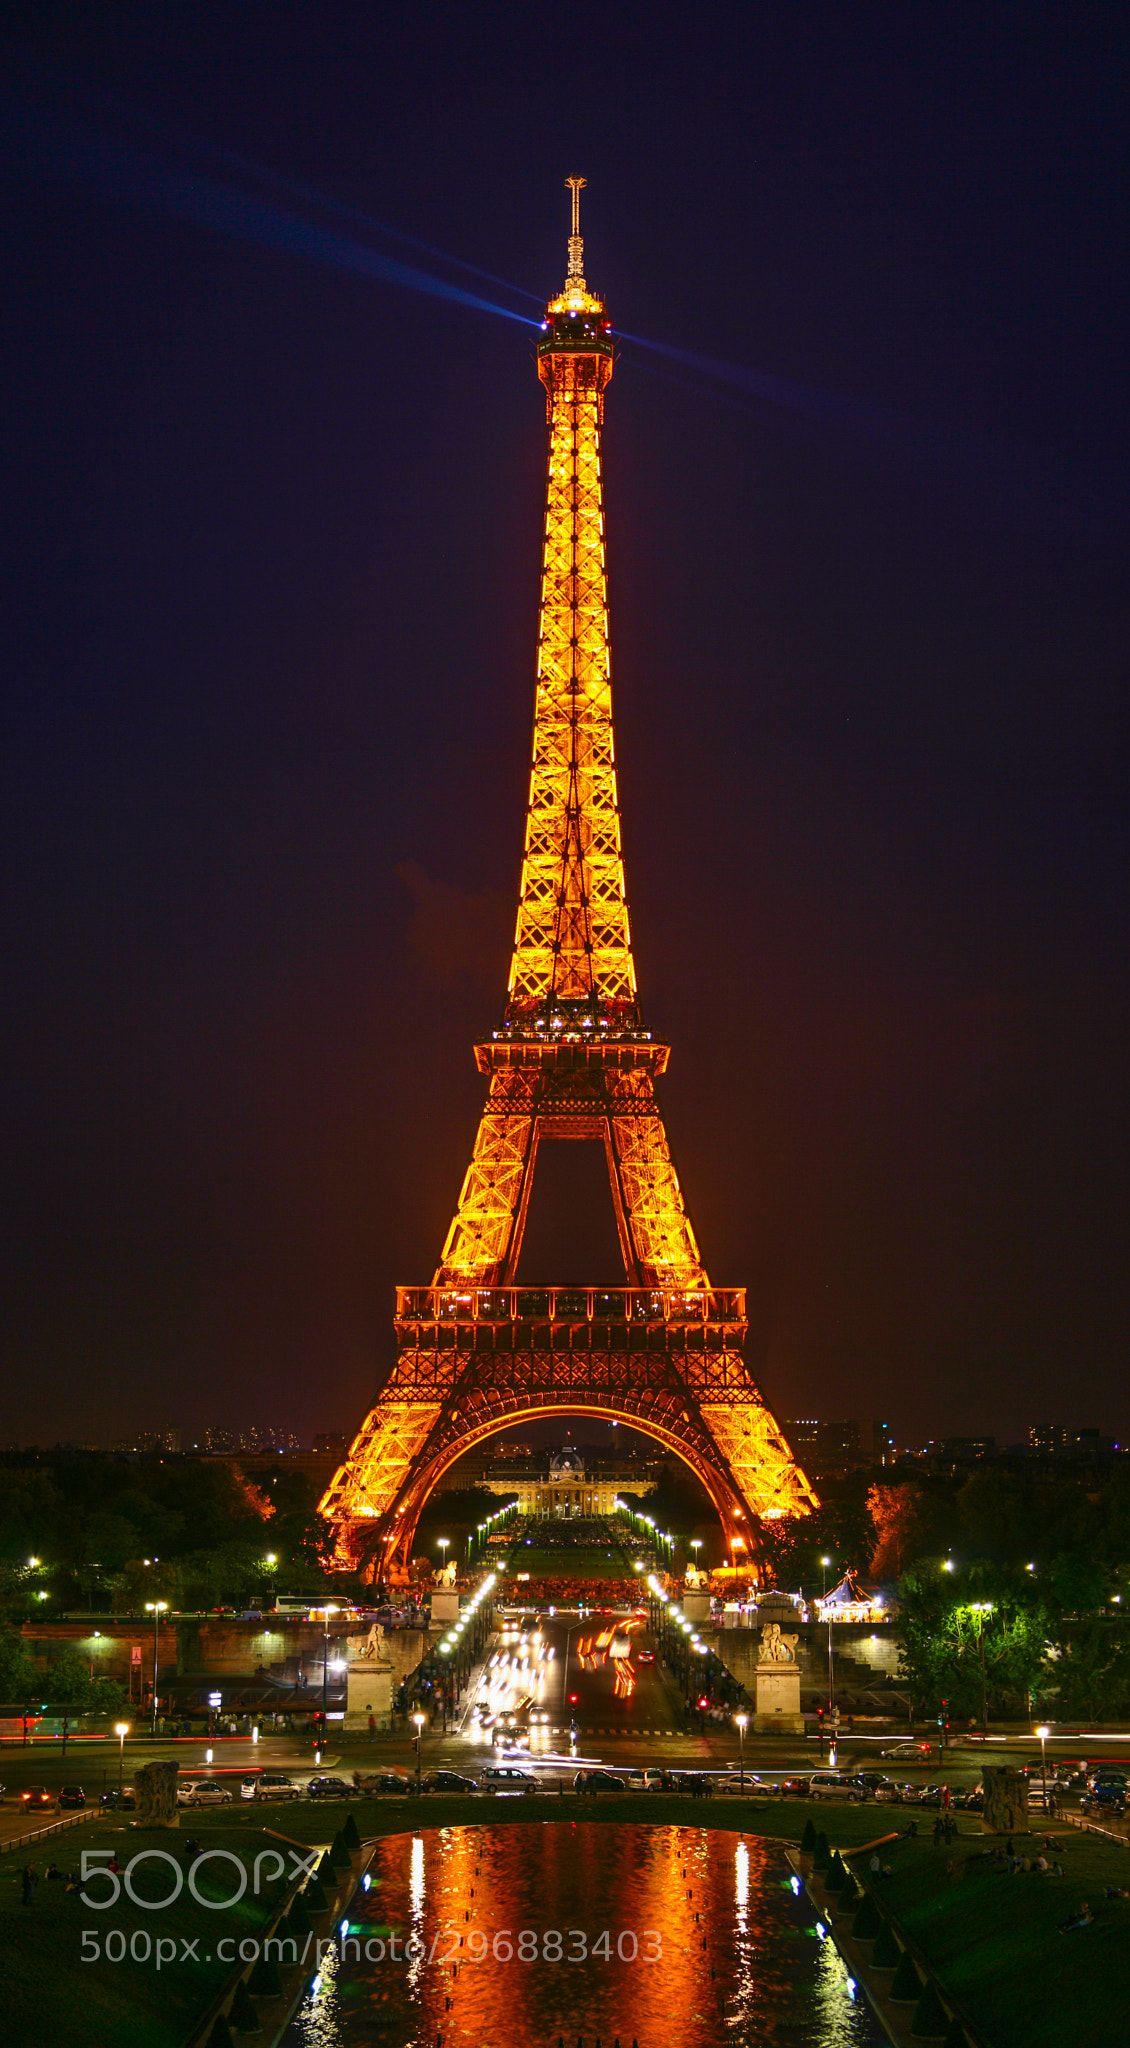 Eiffel Tower At Night By Sunj99 Eiffel Tower At Night Eiffel Tower Paris At Night